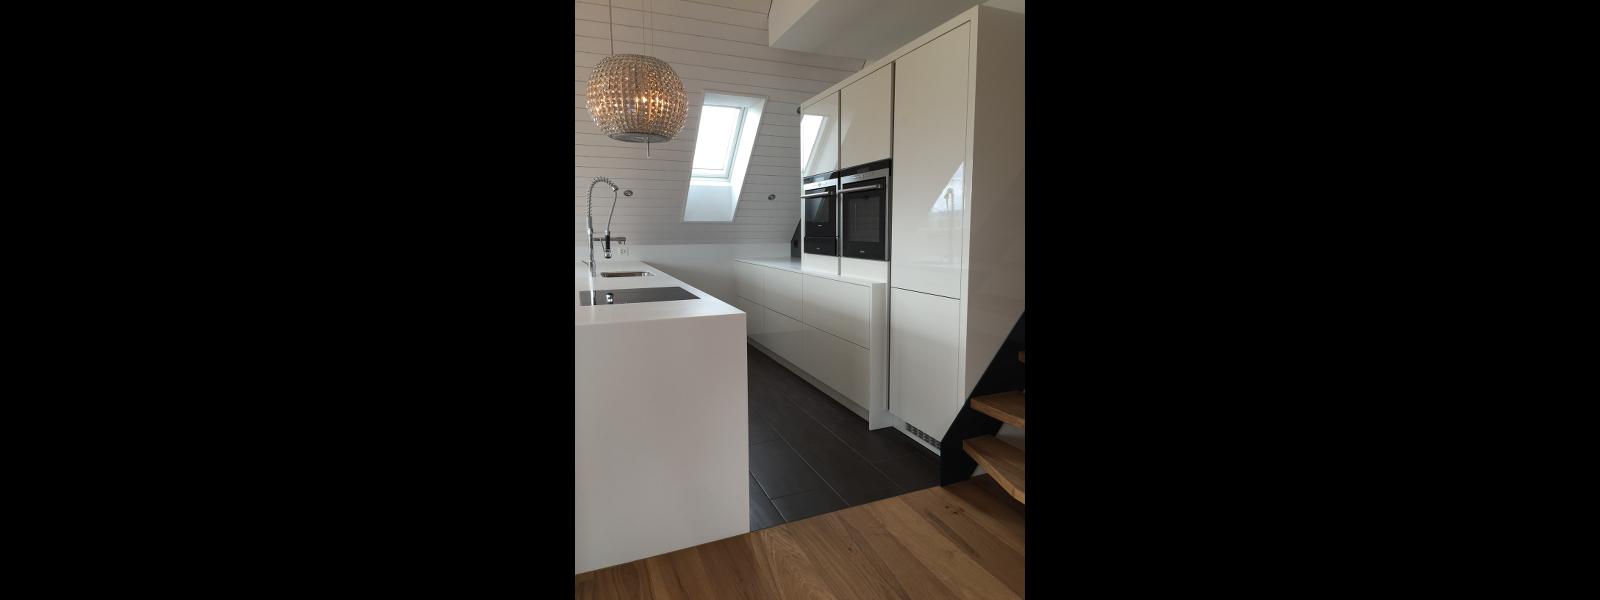 anfahrt walter winteler. Black Bedroom Furniture Sets. Home Design Ideas